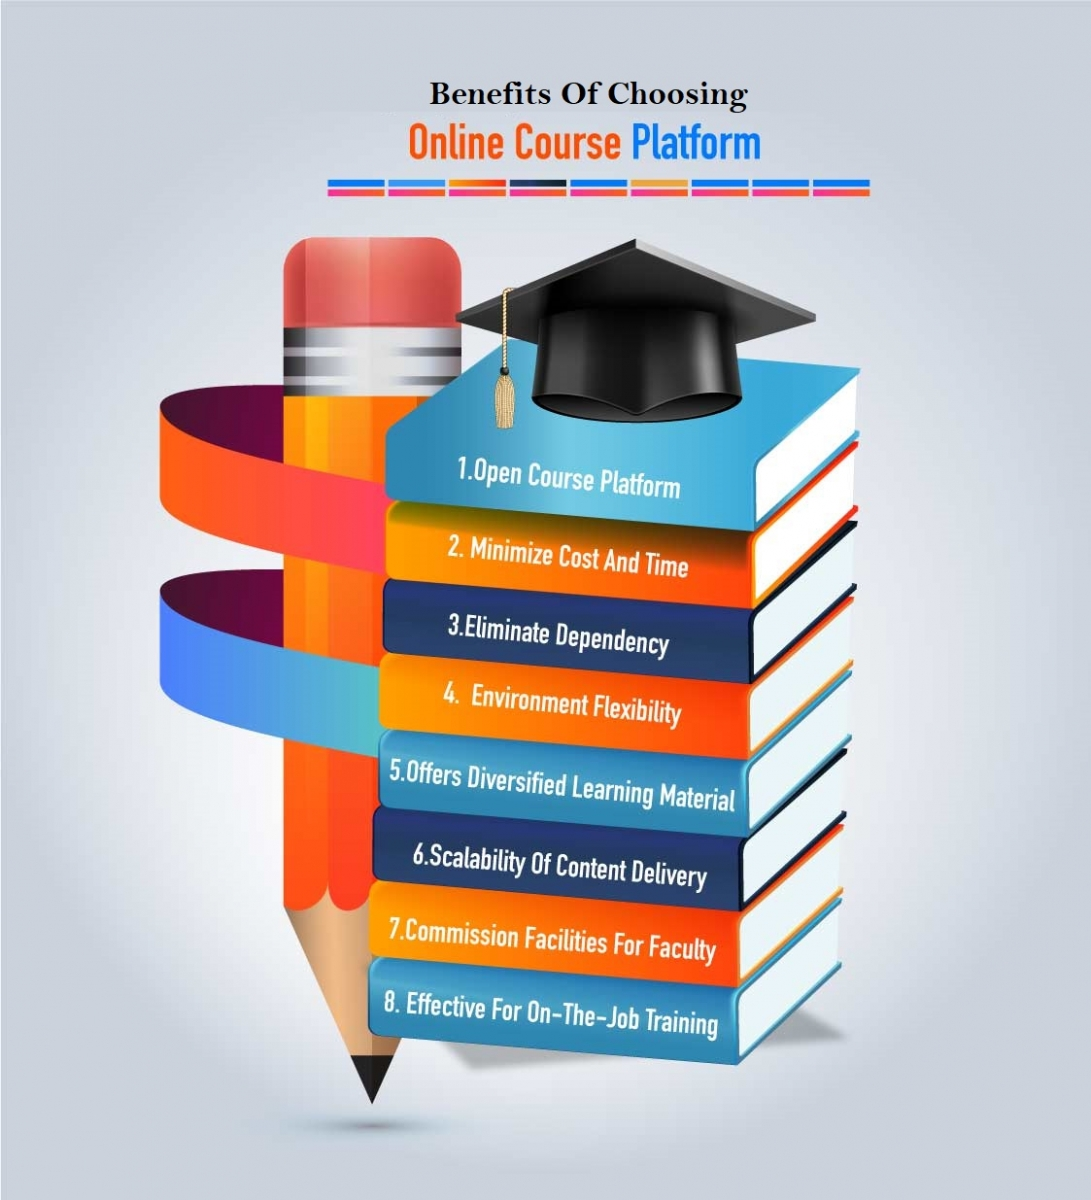 Benefits Of Choosing Online Course Platform